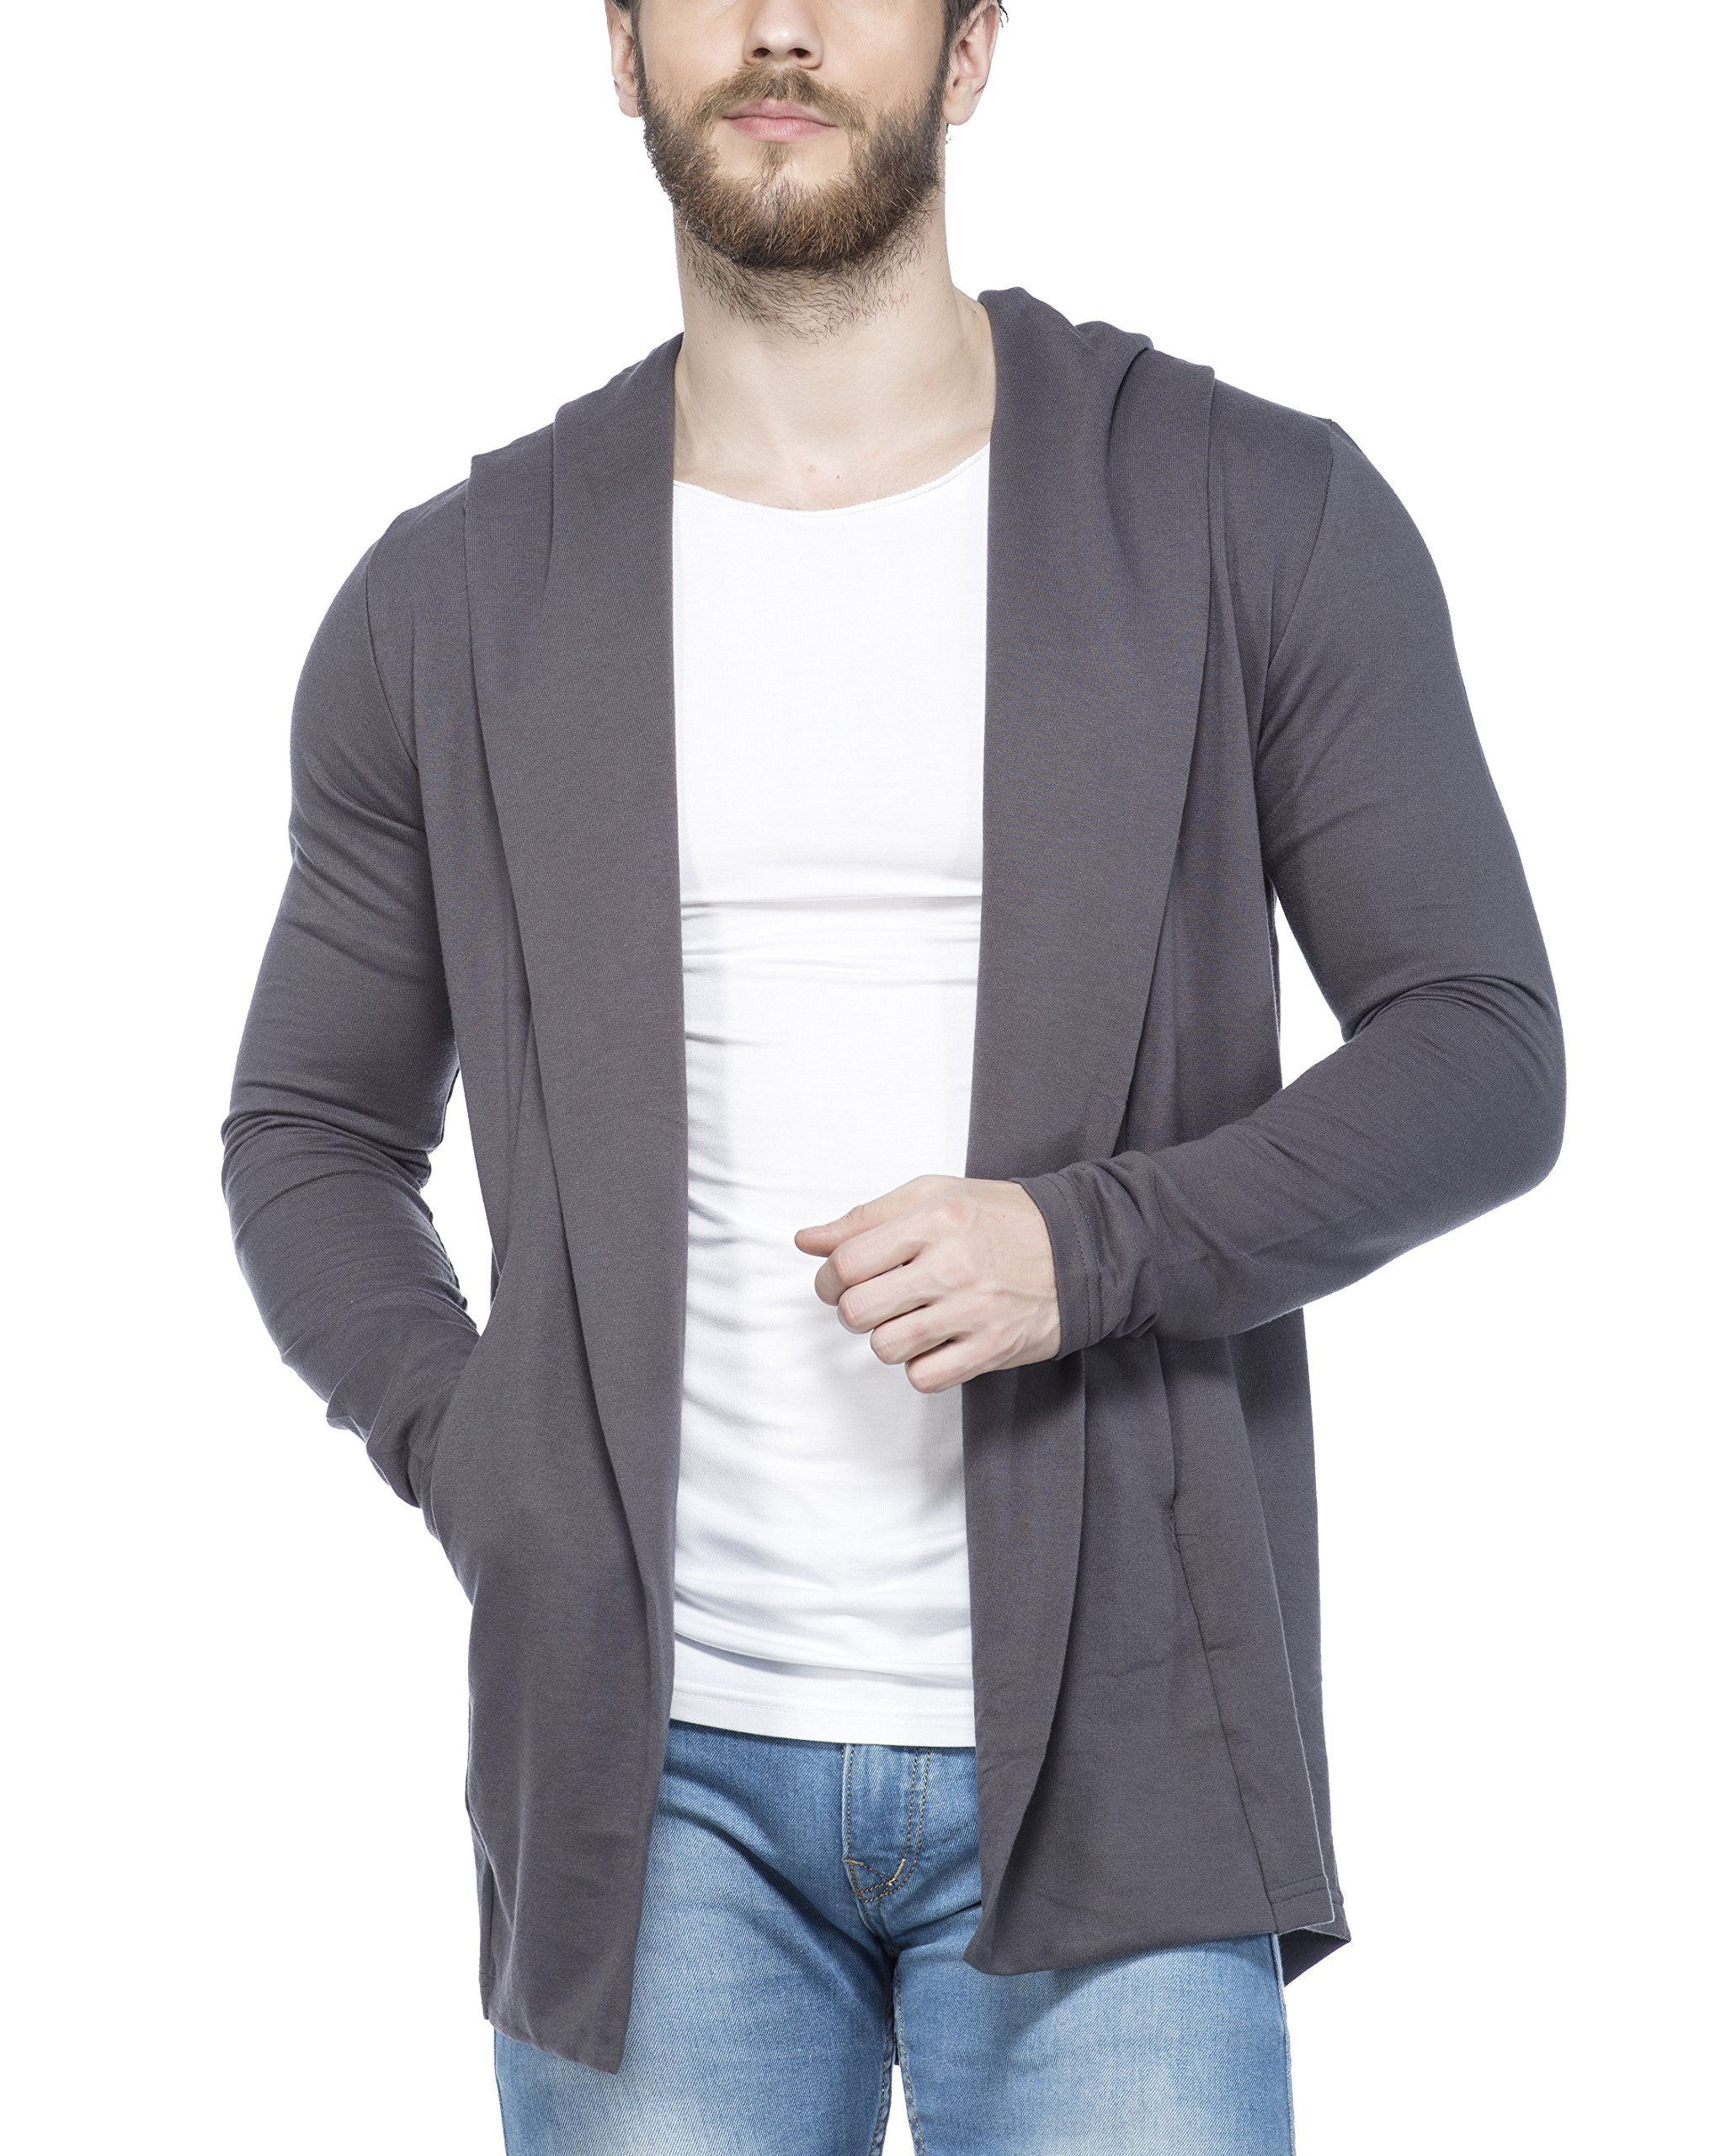 Tinted Men's Cotton Blend Hooded Cardigan (X-Large, Dark Grey)